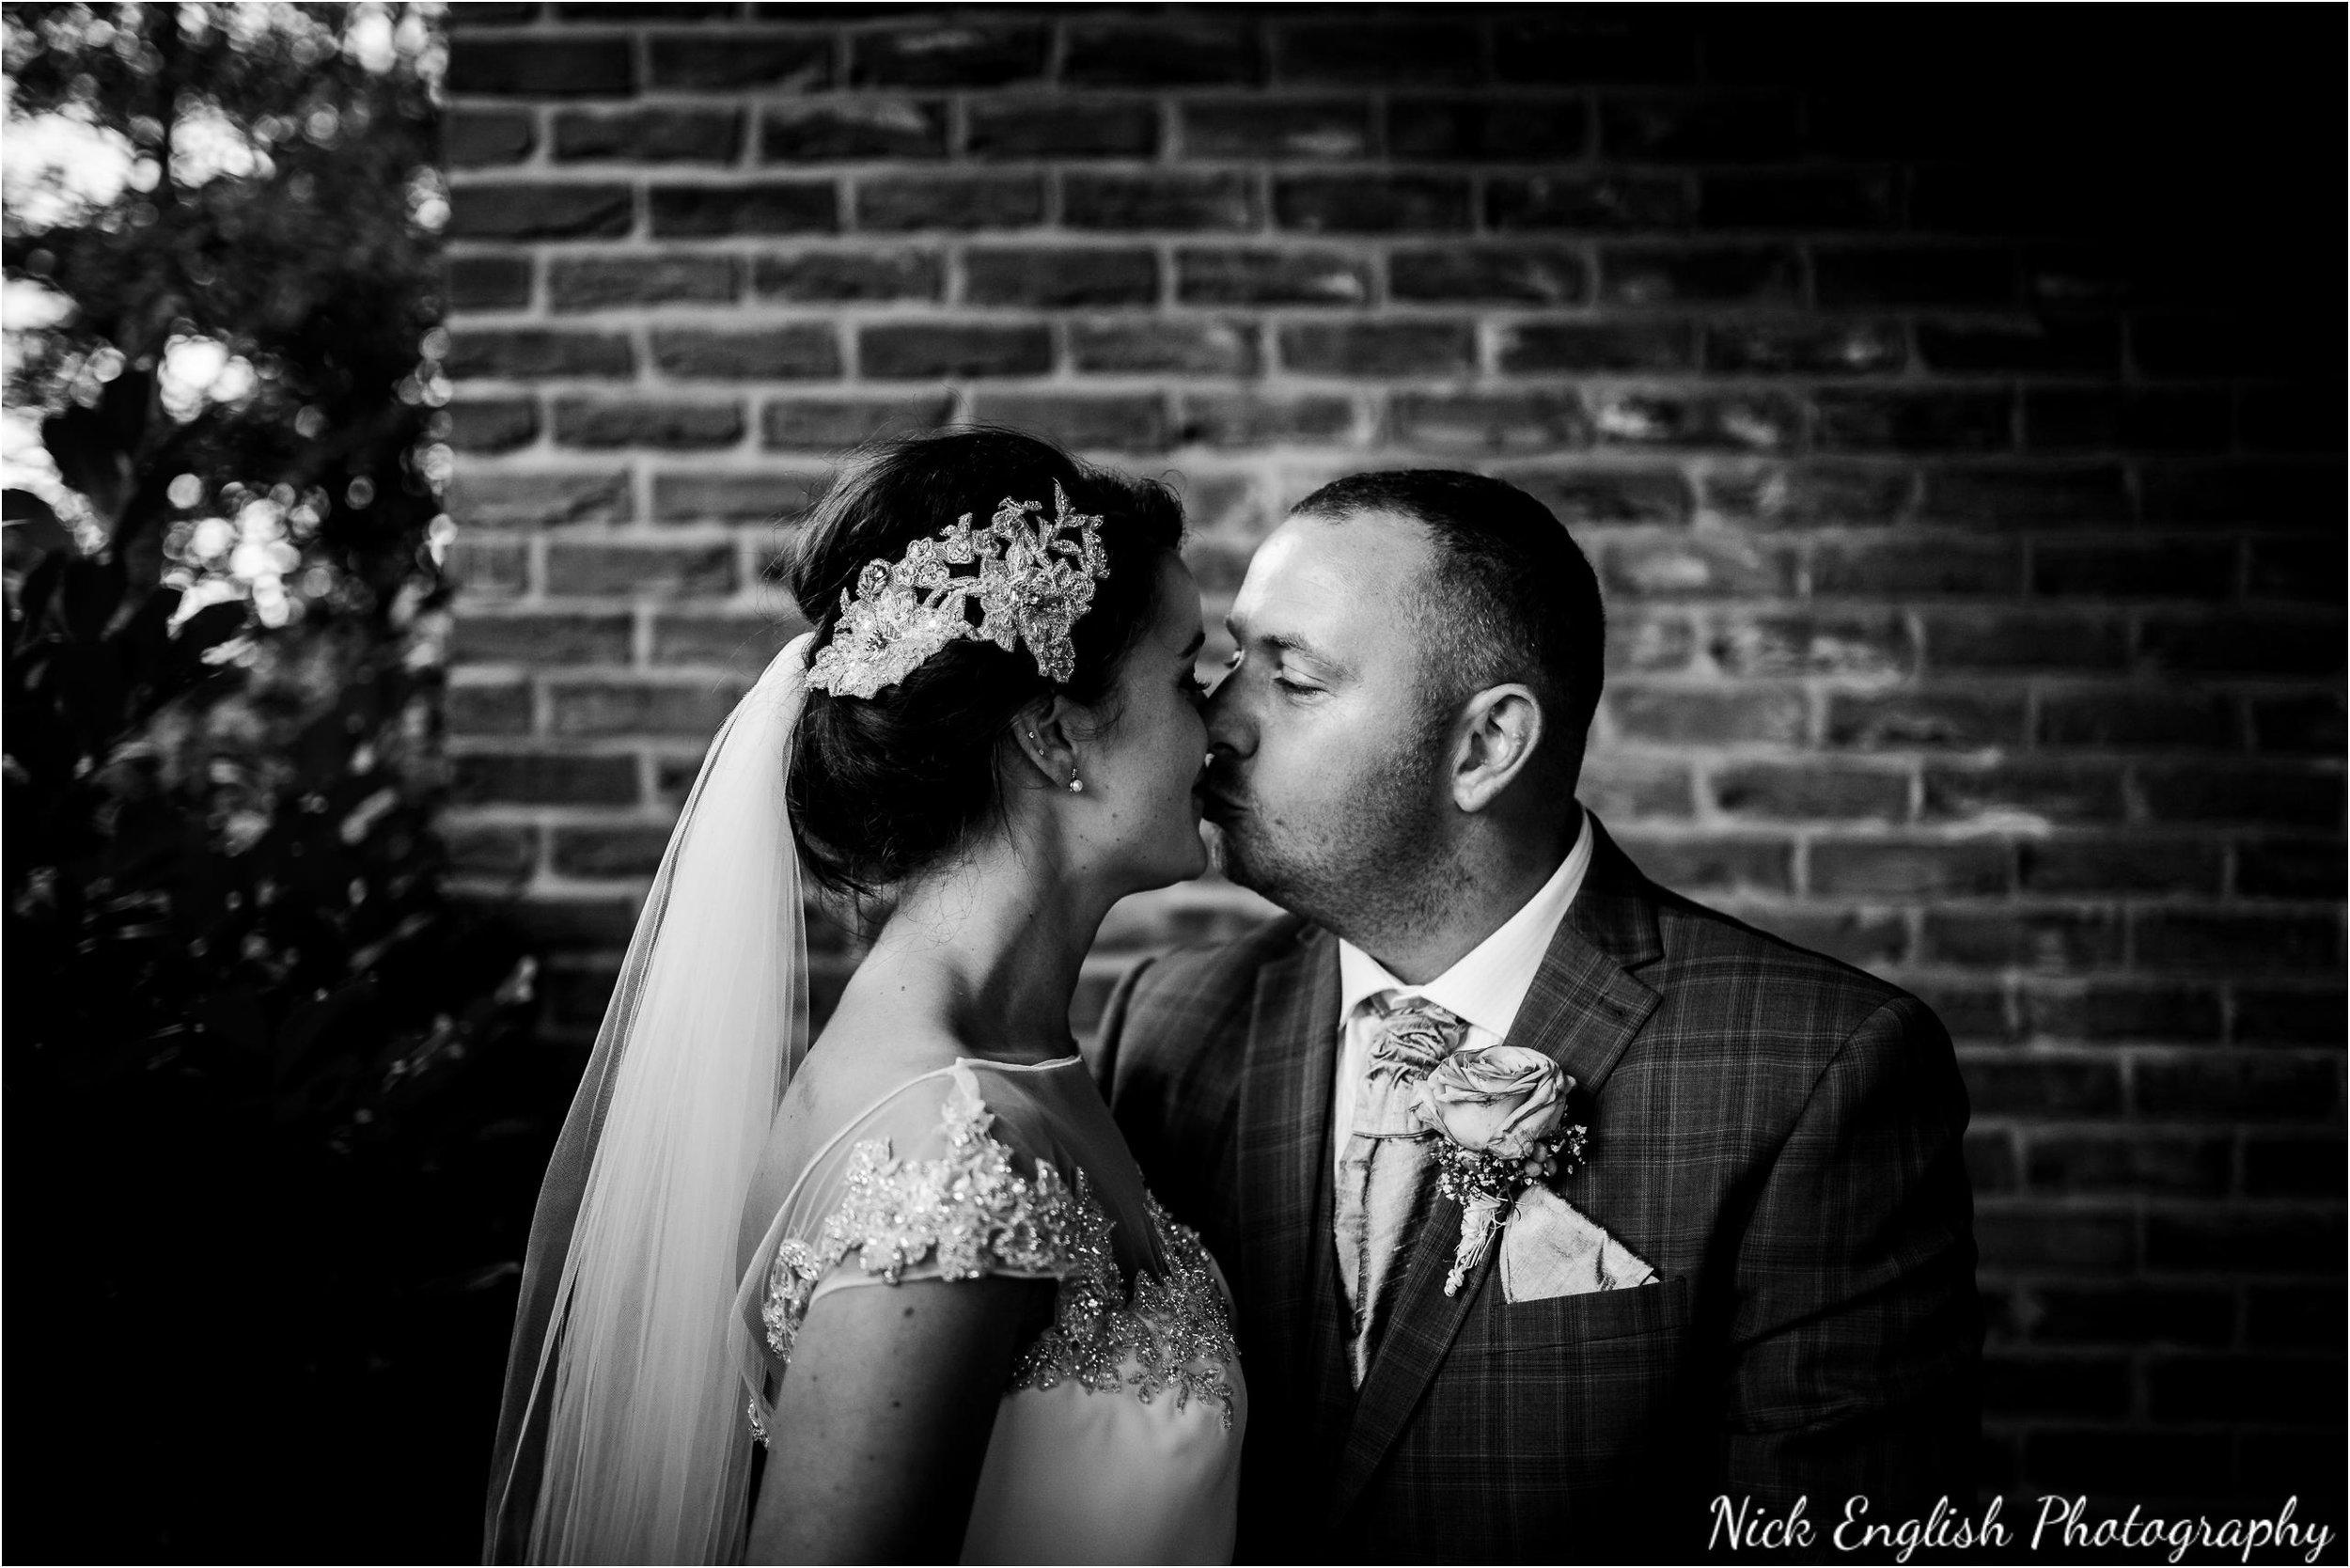 Stacey-Ash-Wedding-Photographs-Stanley-House-Preston-Lancashire-227.jpg